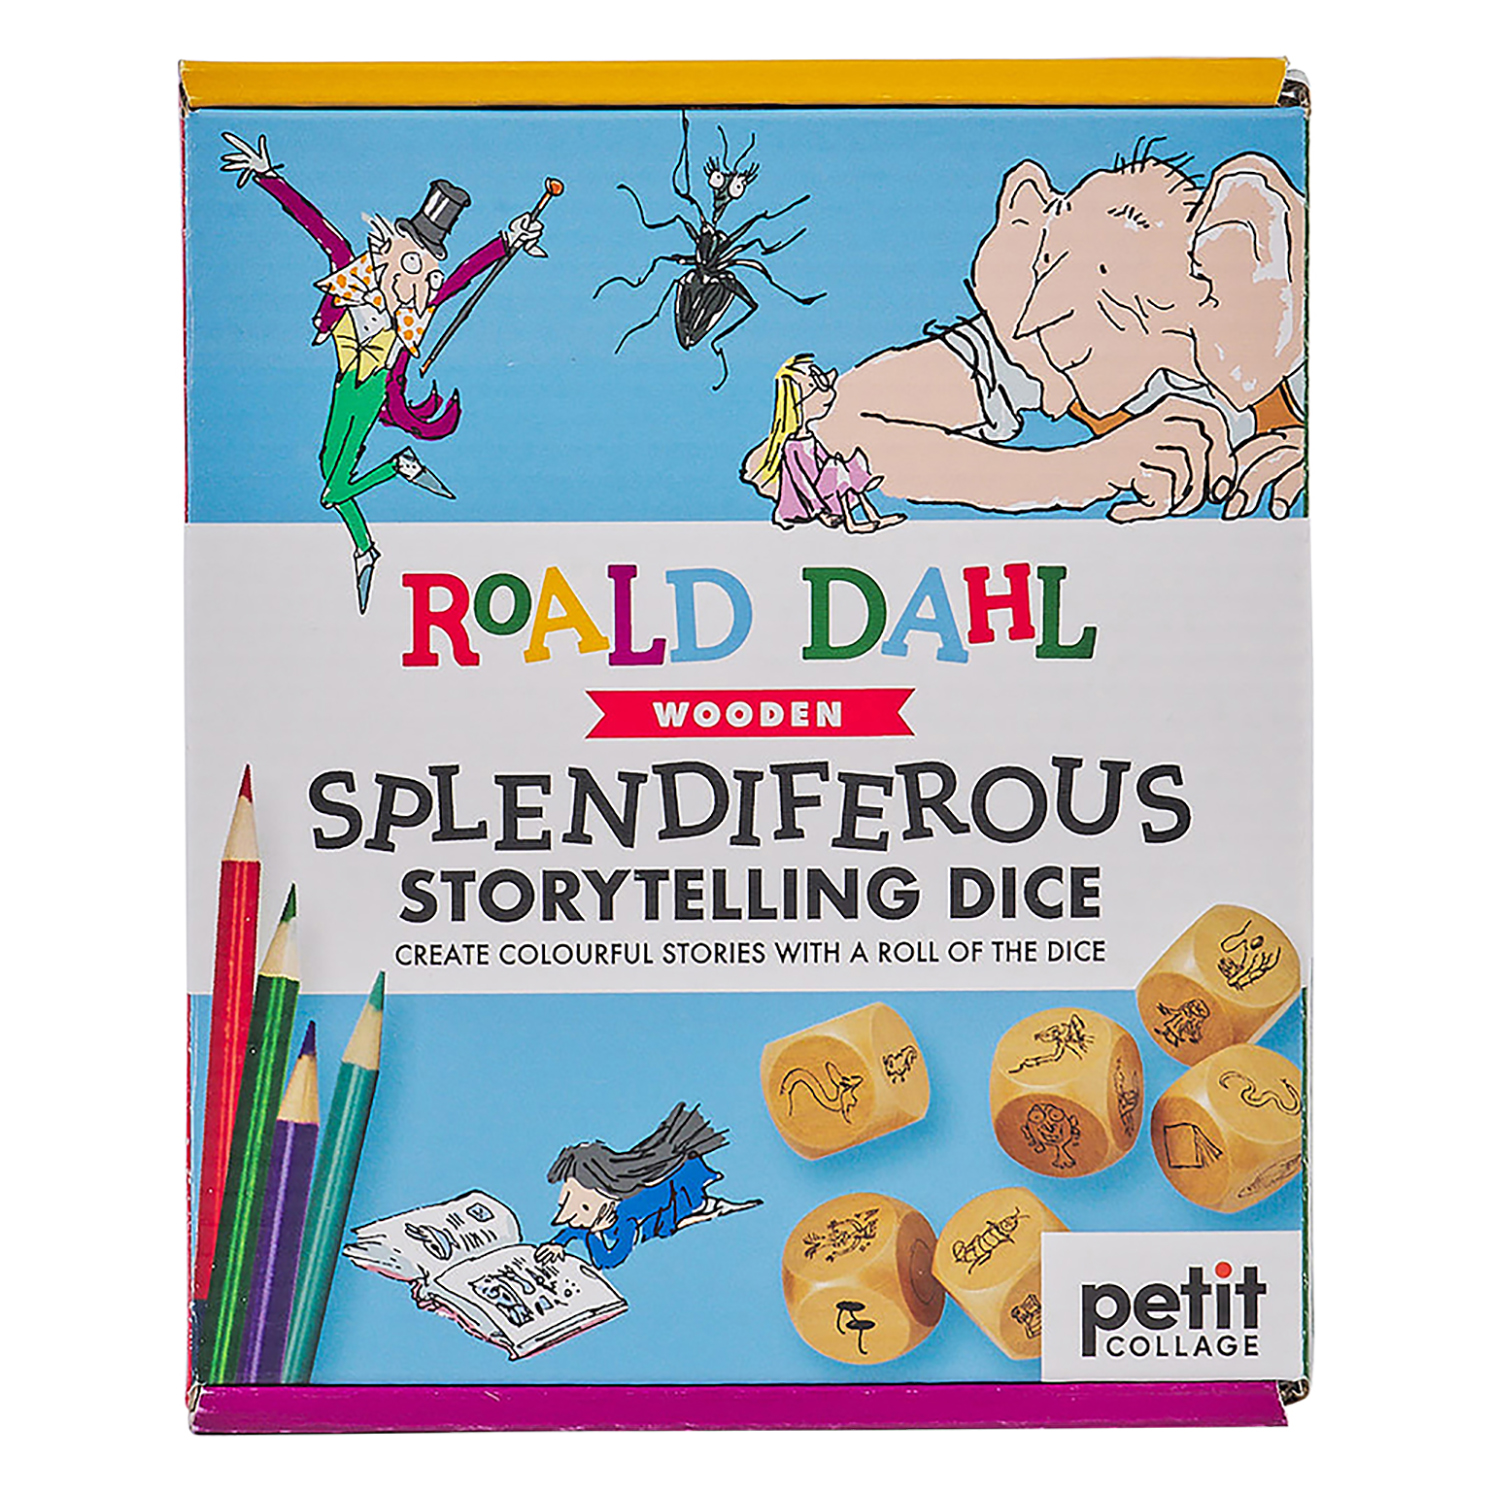 Petit Collage – Roald Dahl Splendiferous Storytelling Dice in Gift Box